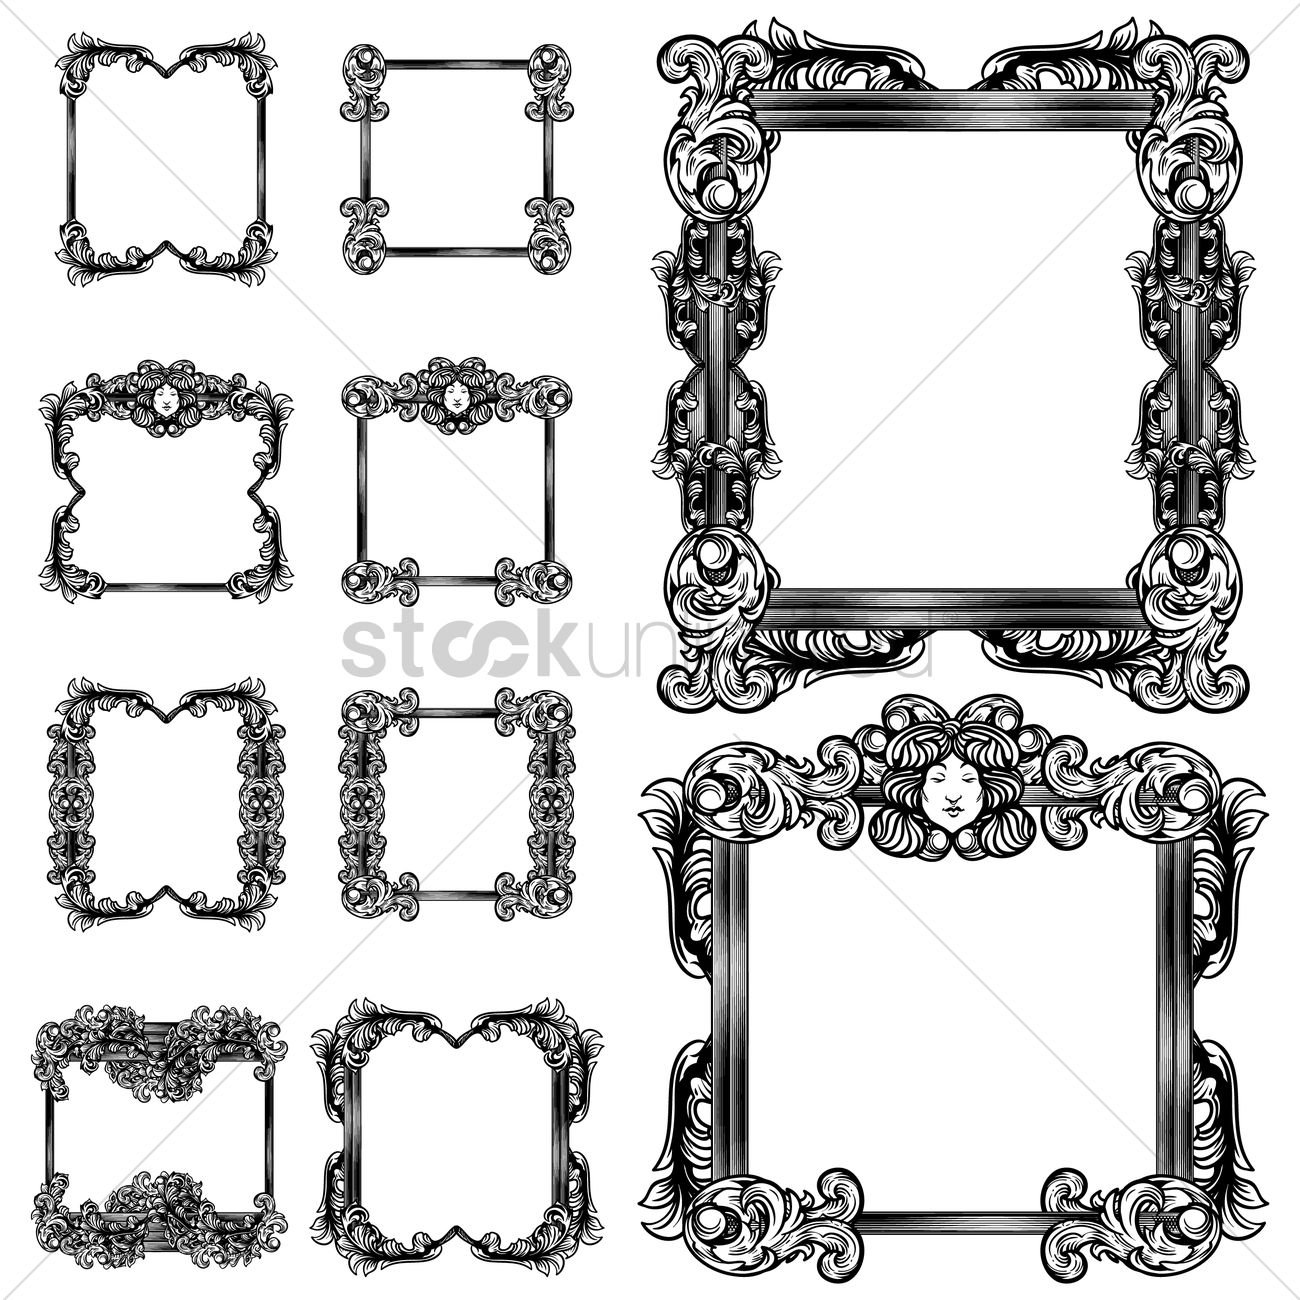 Collection of unique retro frames Vector Image - 1871888 ...